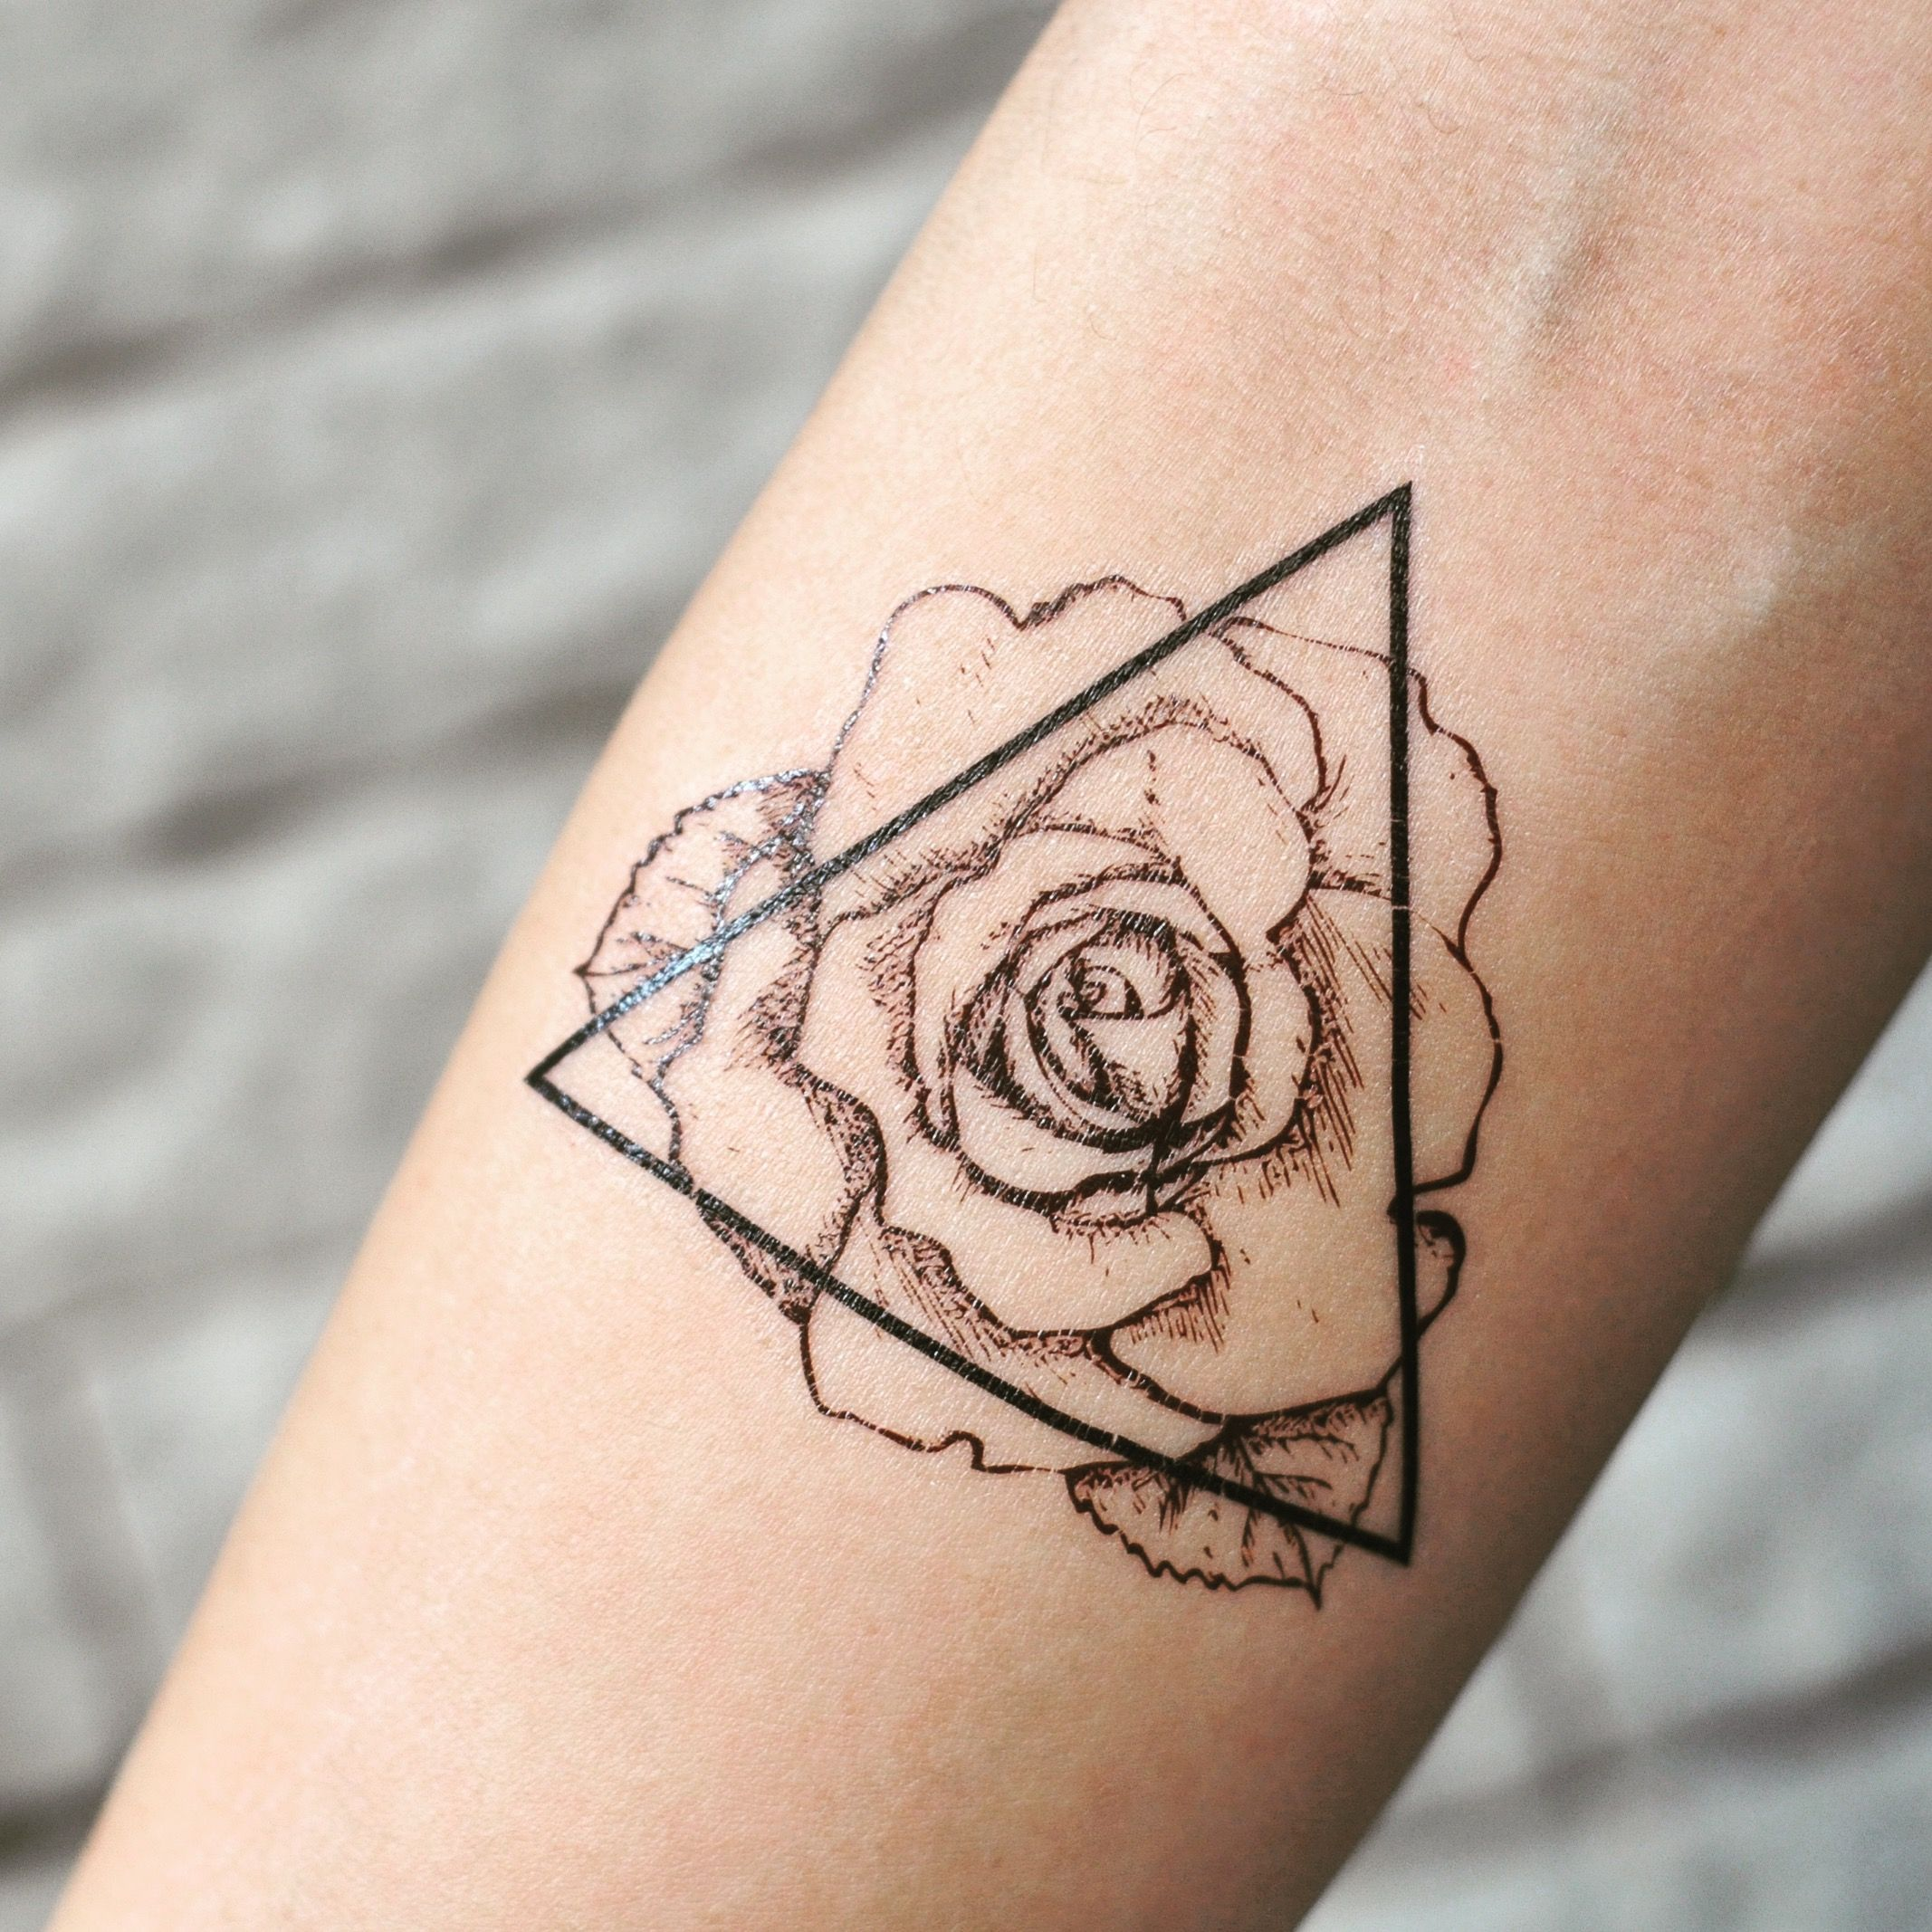 Cover Up Rose Outline: Triangle Rose Outline Temporary Tattoo Sticker (Set Of 2